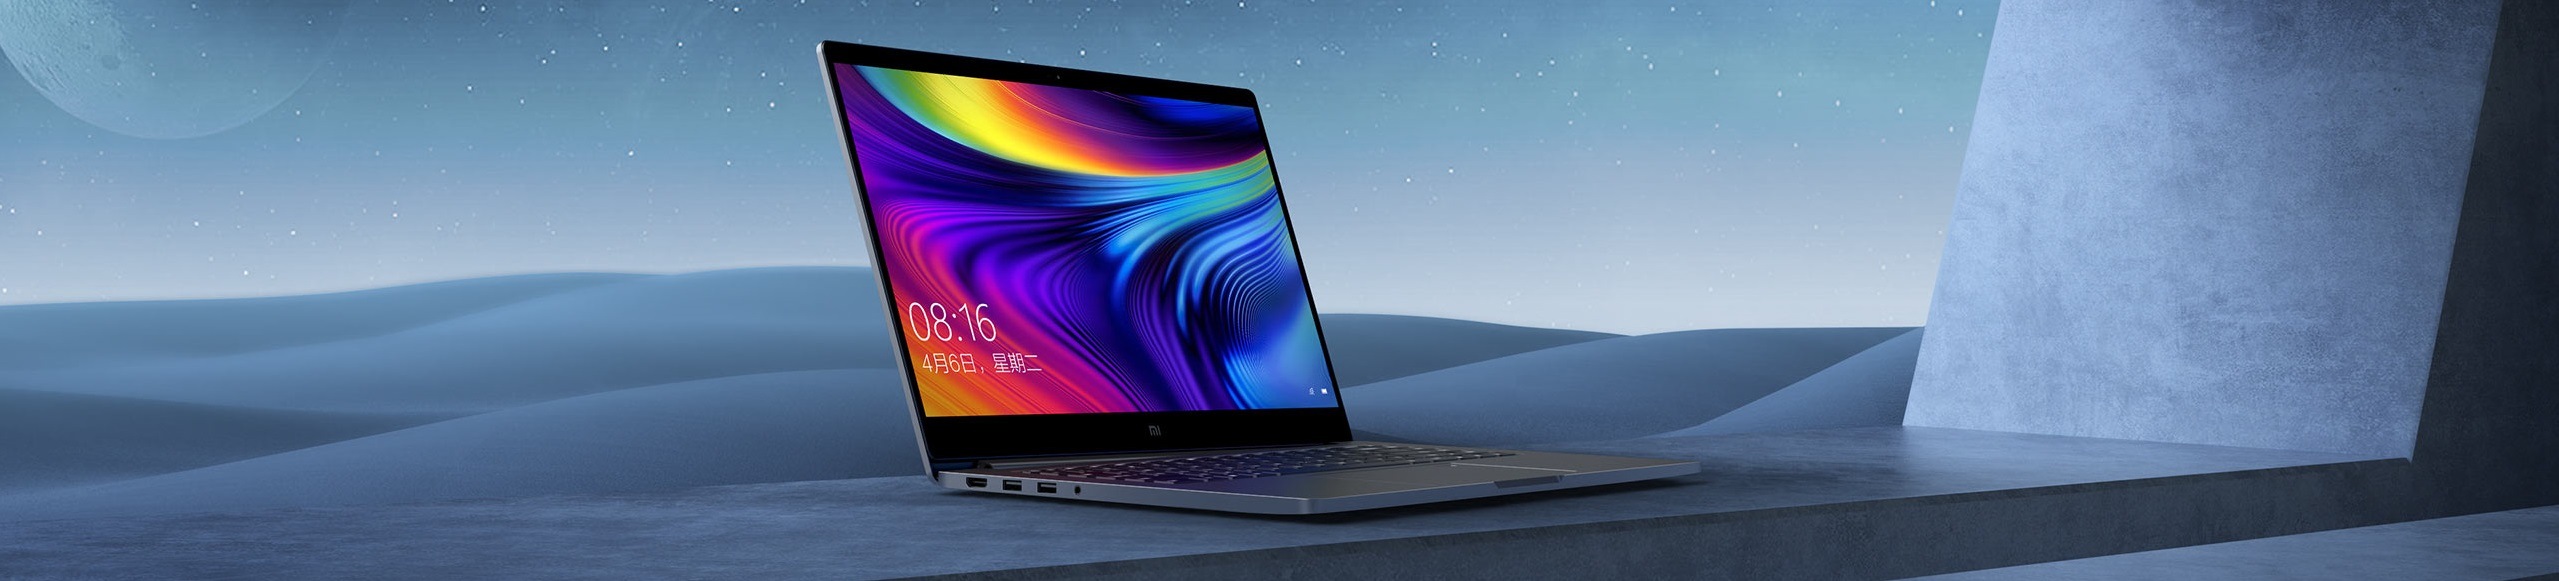 Xiaomi Mi Notebook 15 Pro 2020 laptop